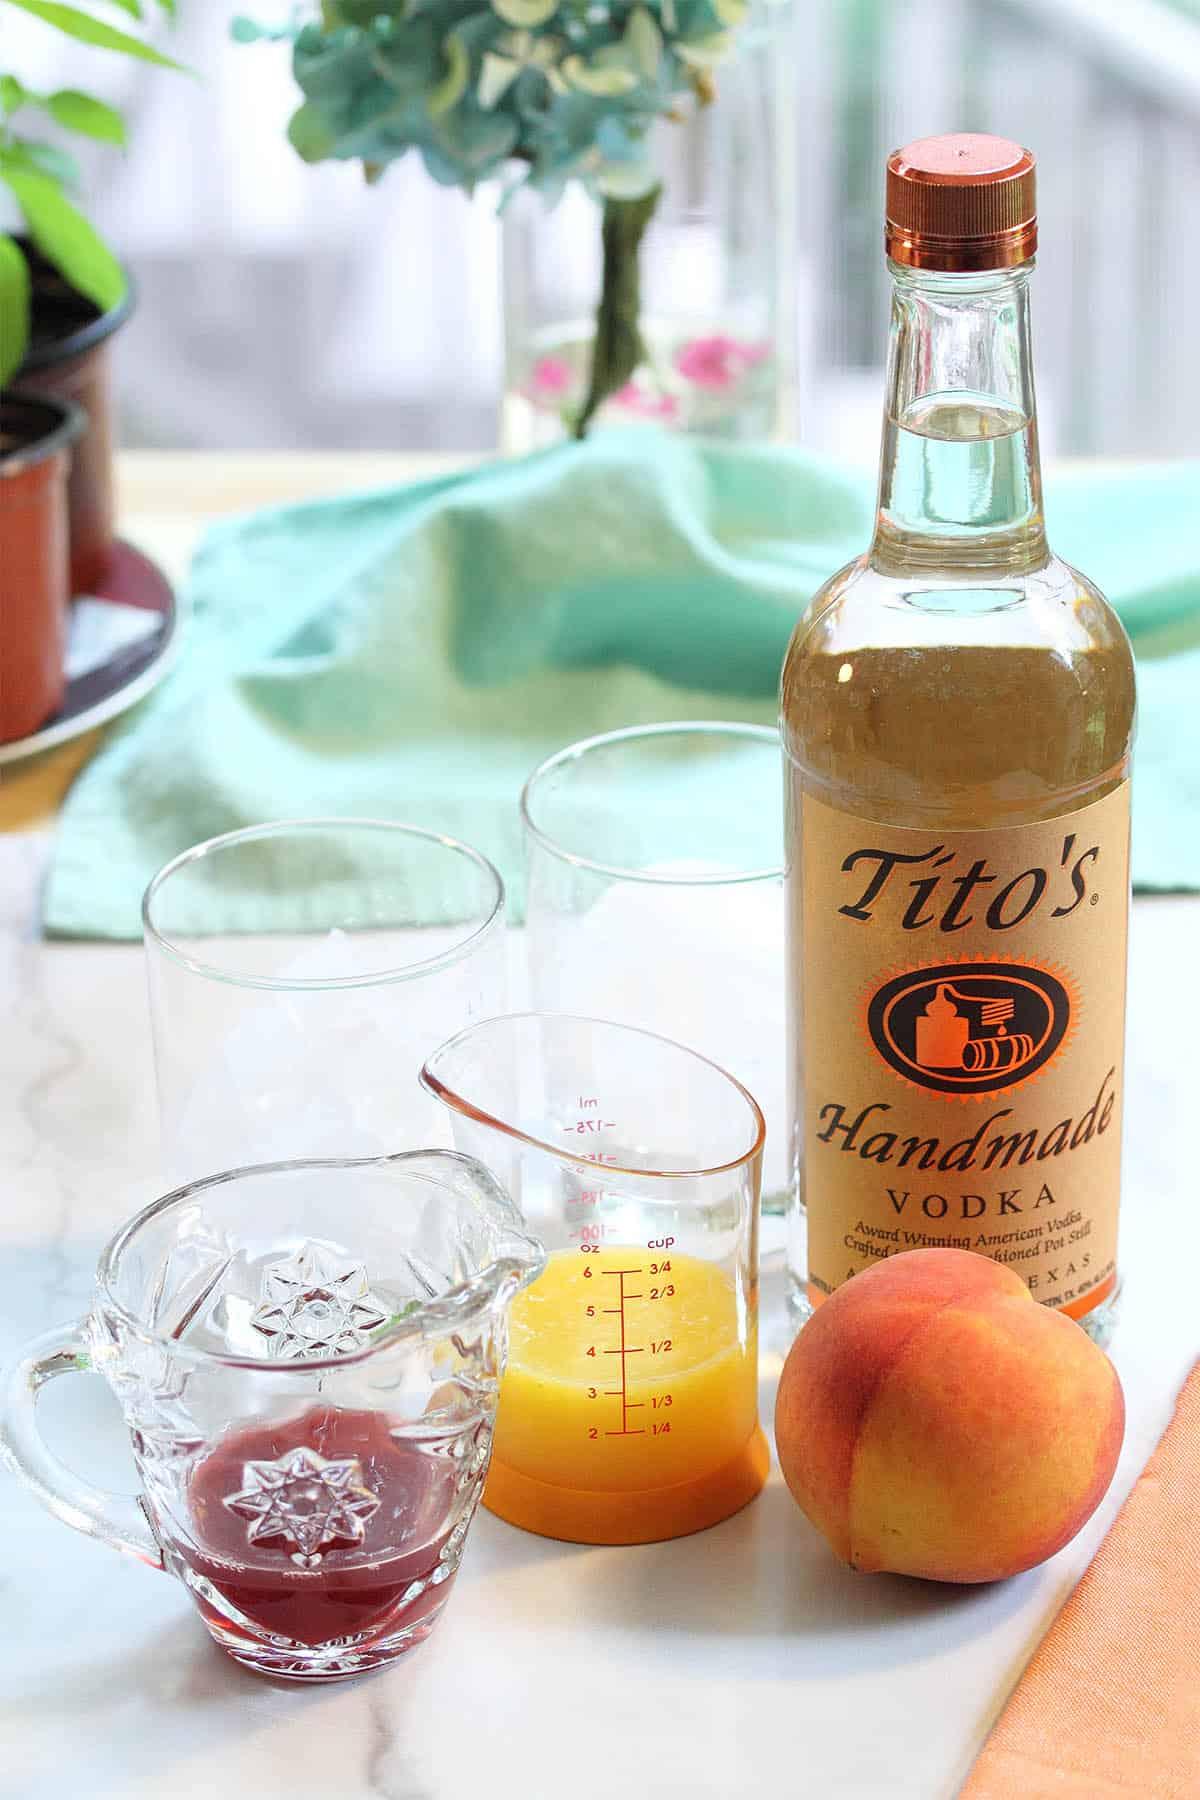 Ingredients vodka, peach, orange juice, cranberry juice on white table.